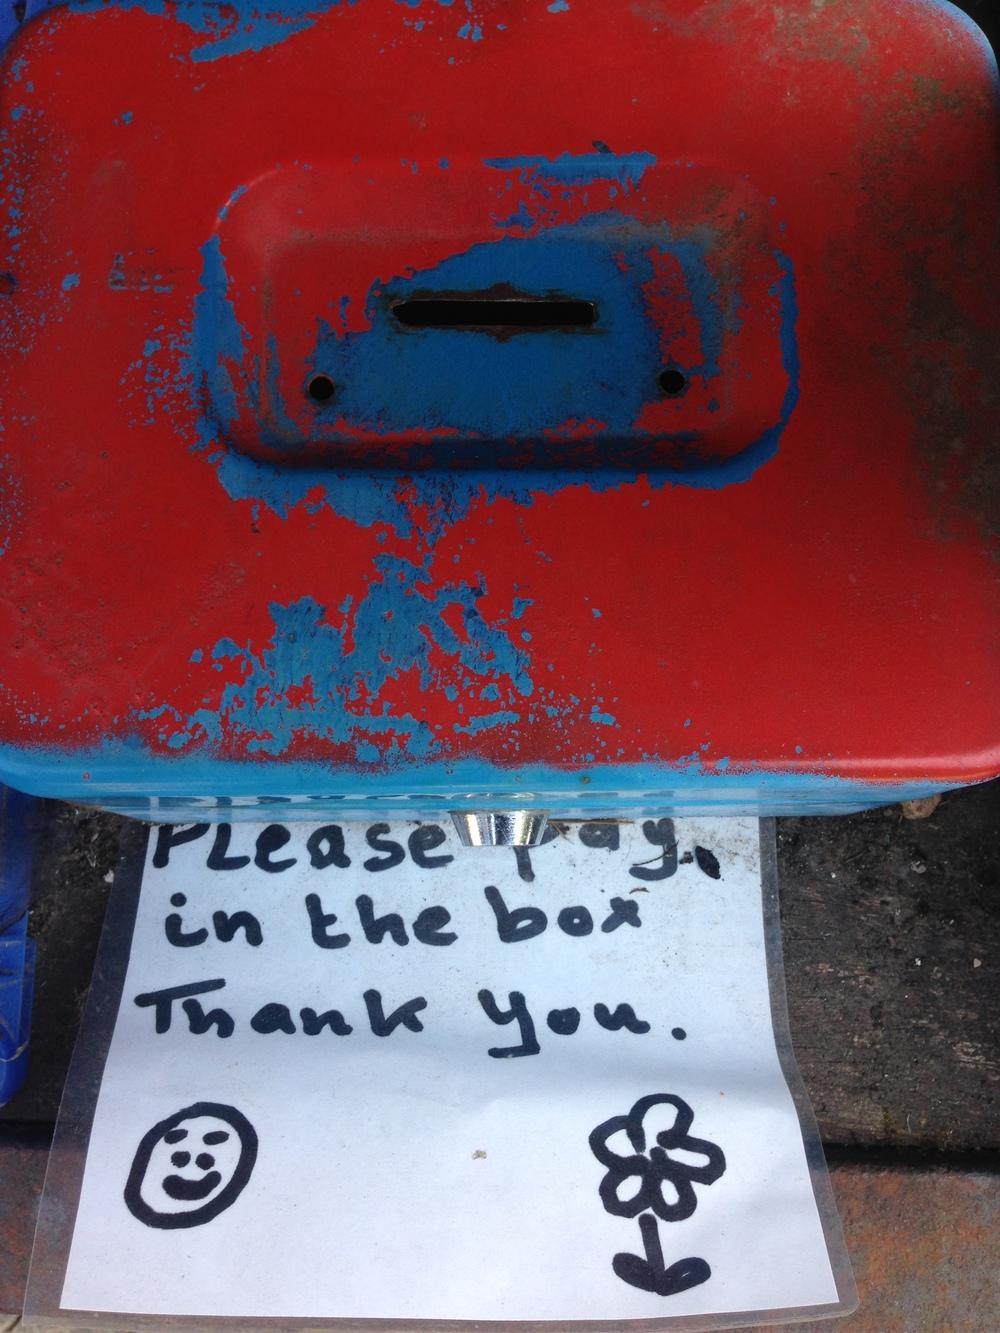 An honesty box for the fruit & veg for sale